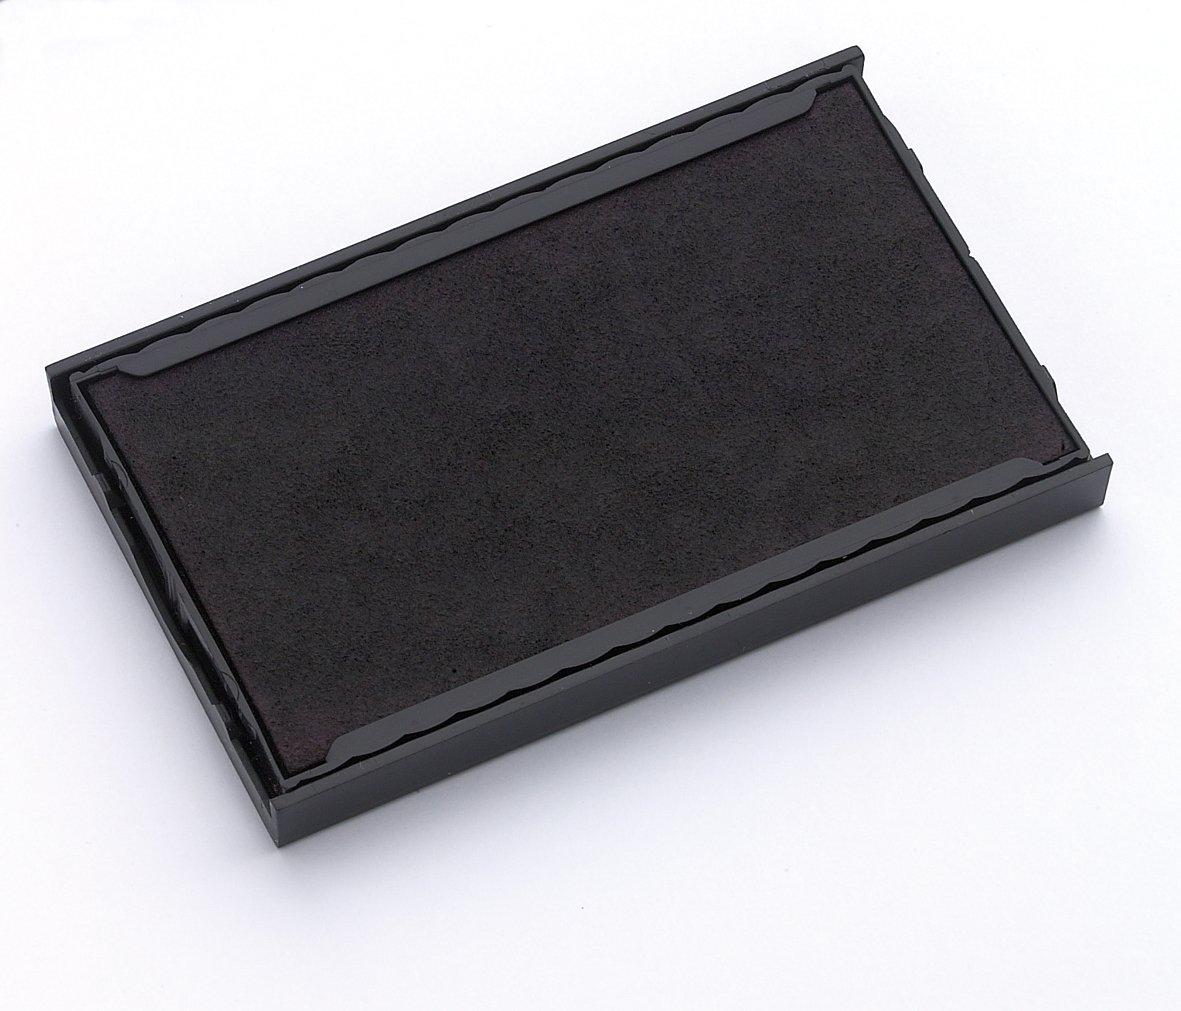 Trodat Reemplazo Pad 6-4926 DB 6/4926 para Printy 4926 y 4726, 2 piezas, negro 6-4926DB